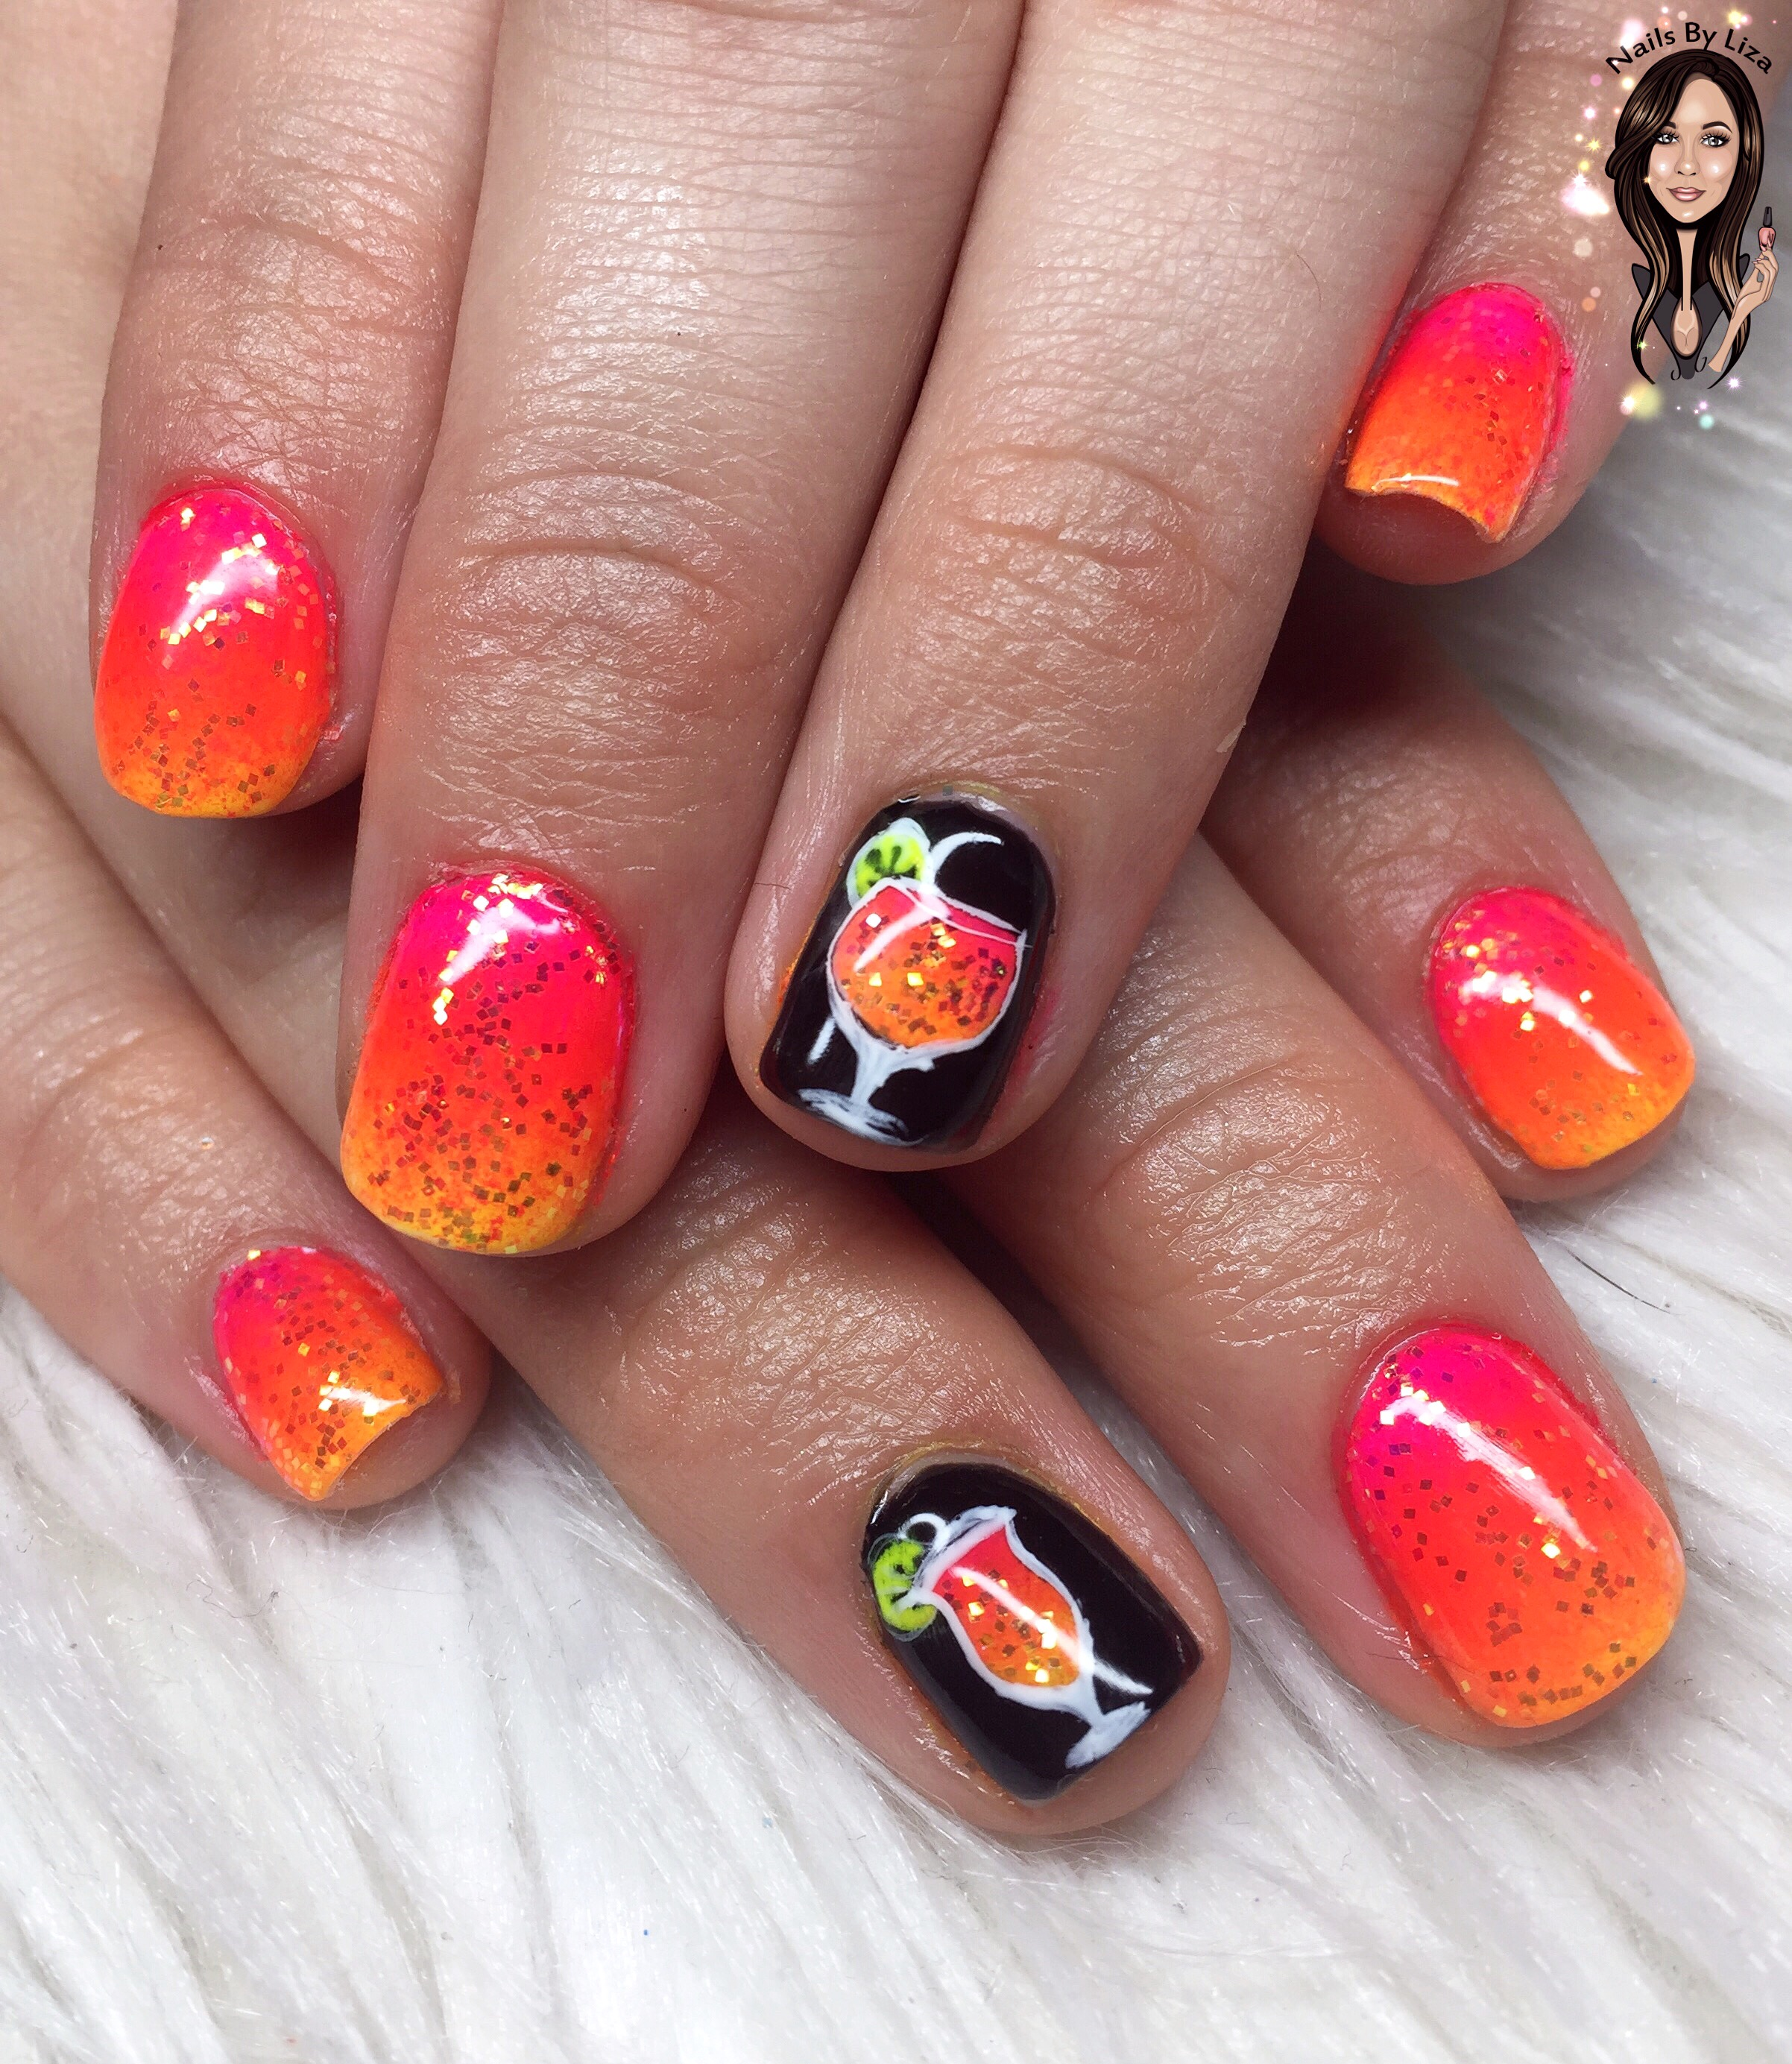 August Nails Nail Art Glastonbury Somerset Nails By Liza